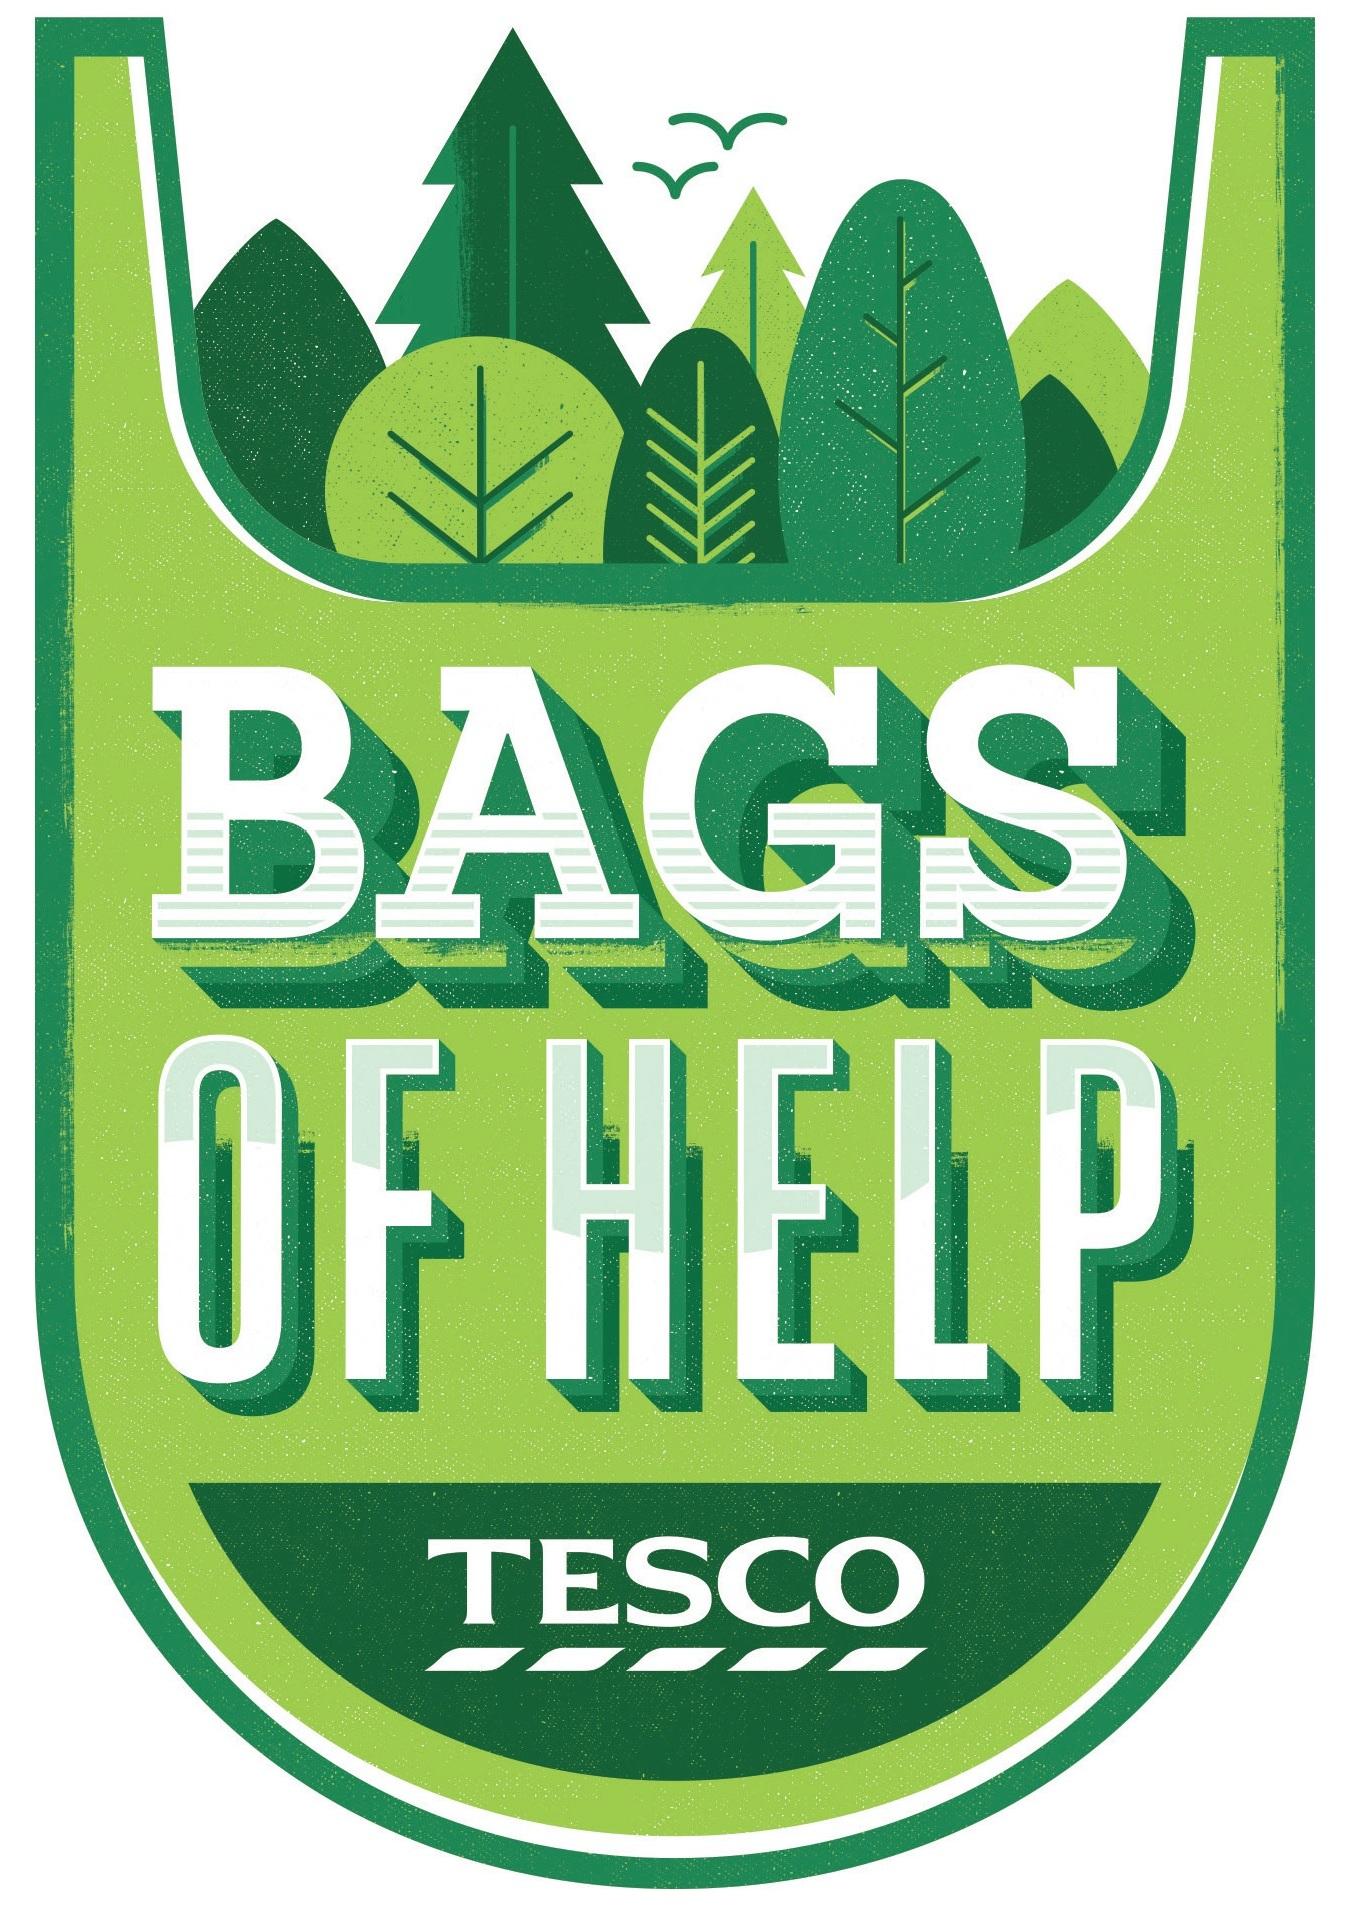 bags-for-help-j-p-e-g.jpg